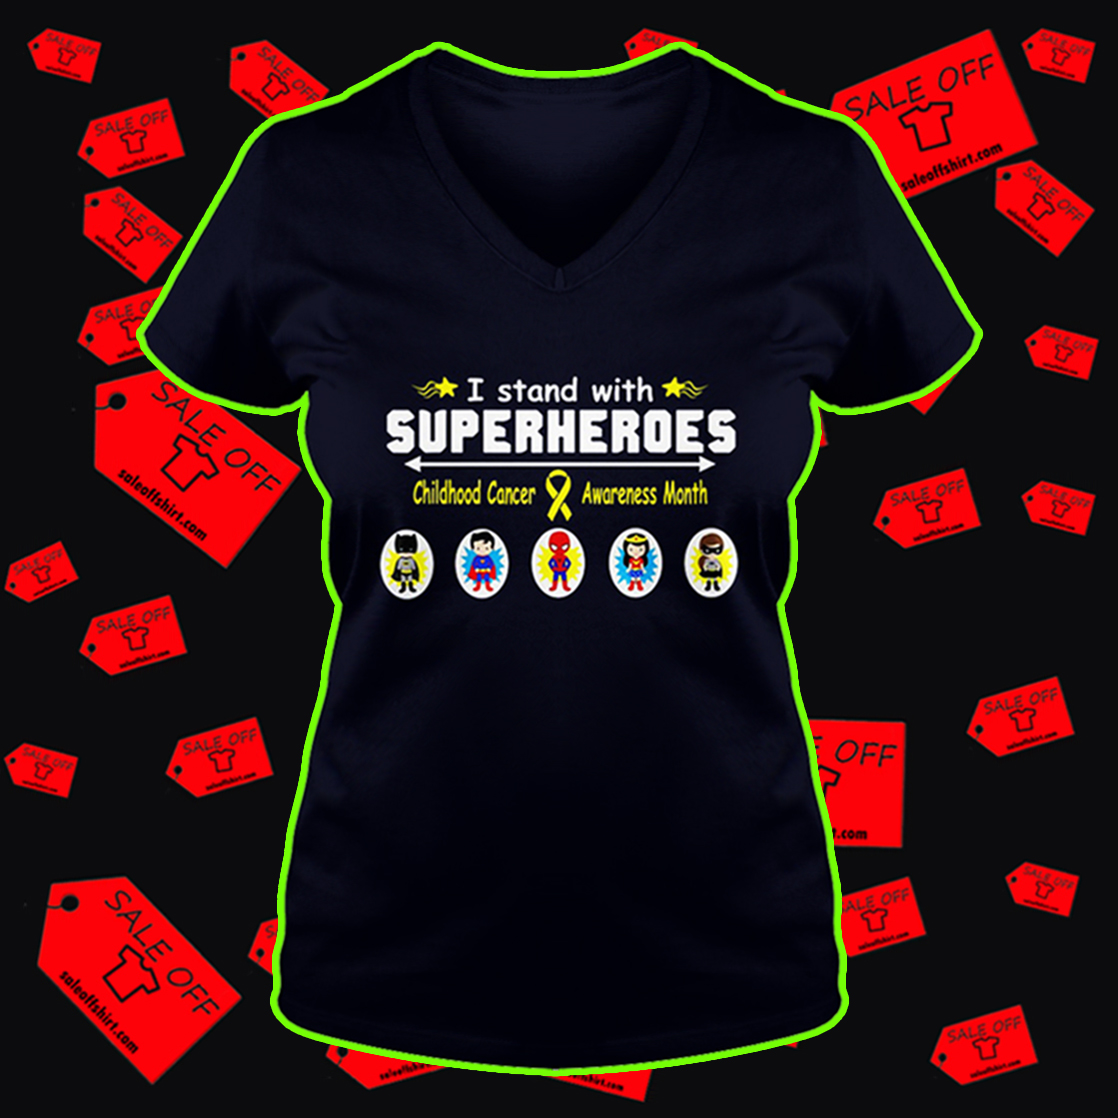 I stand with superheroes childhood cancer awareness month v-neck